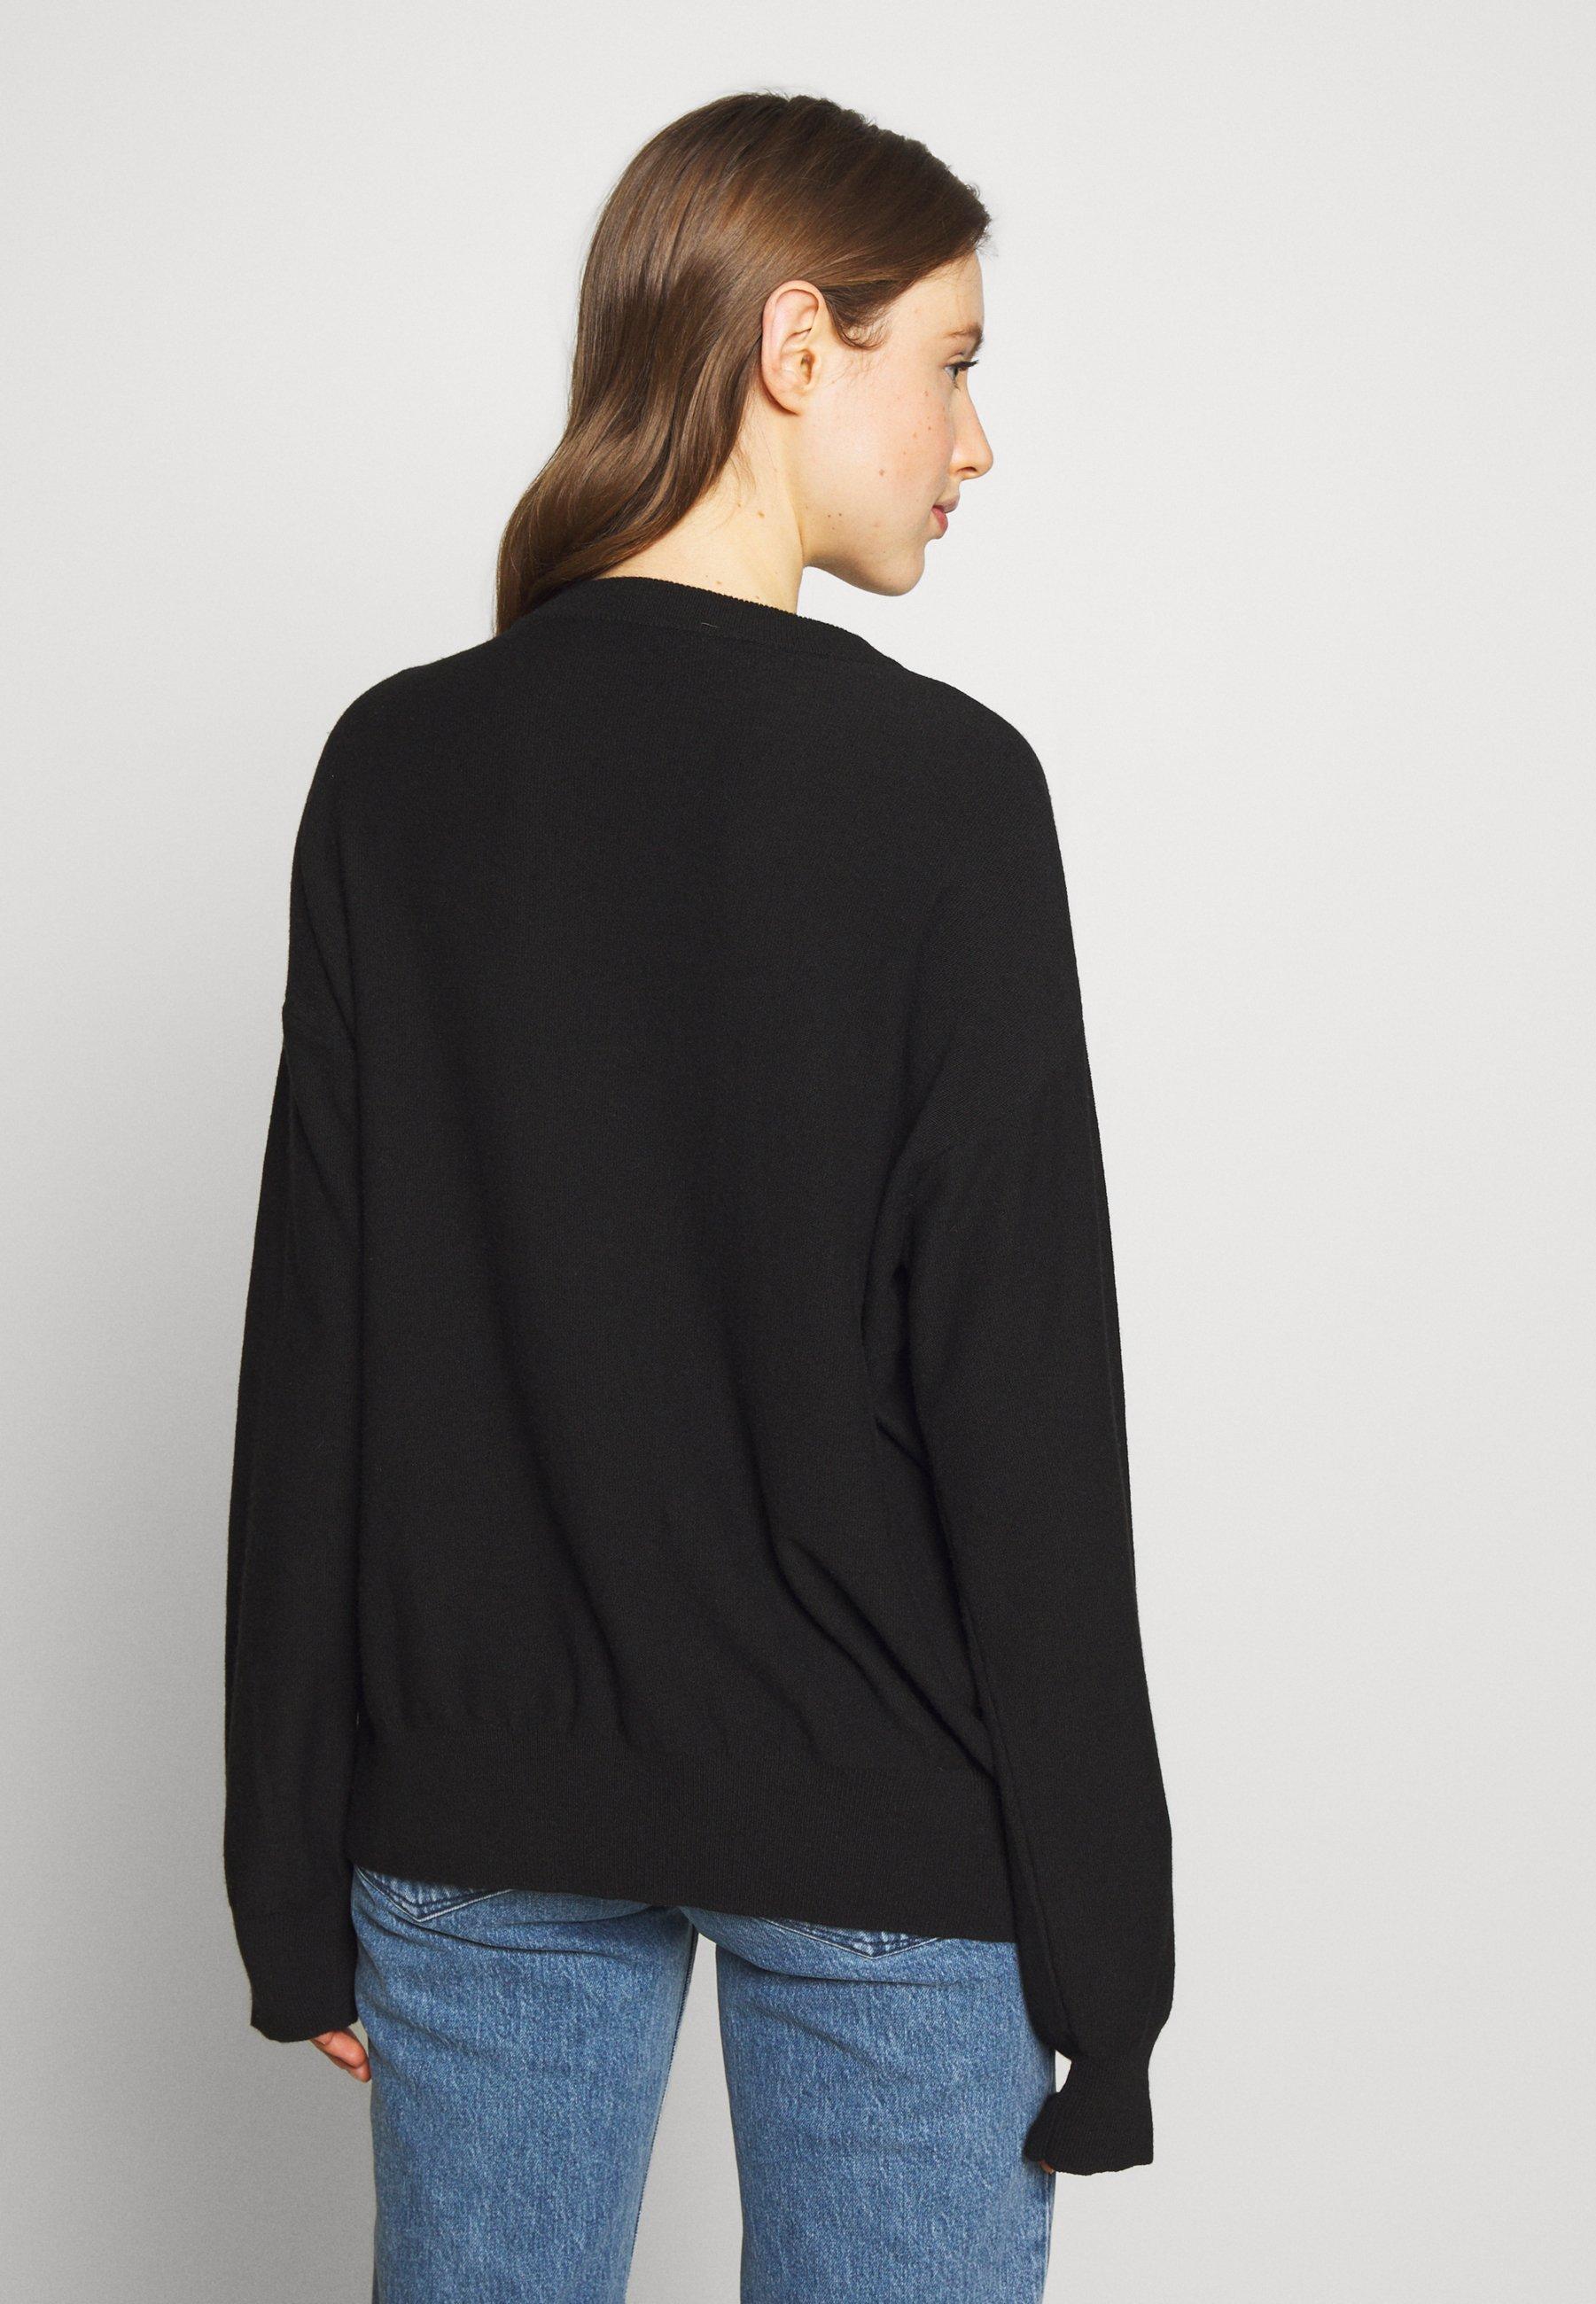 Love Moschino Trui - black - Dames jas Actueel